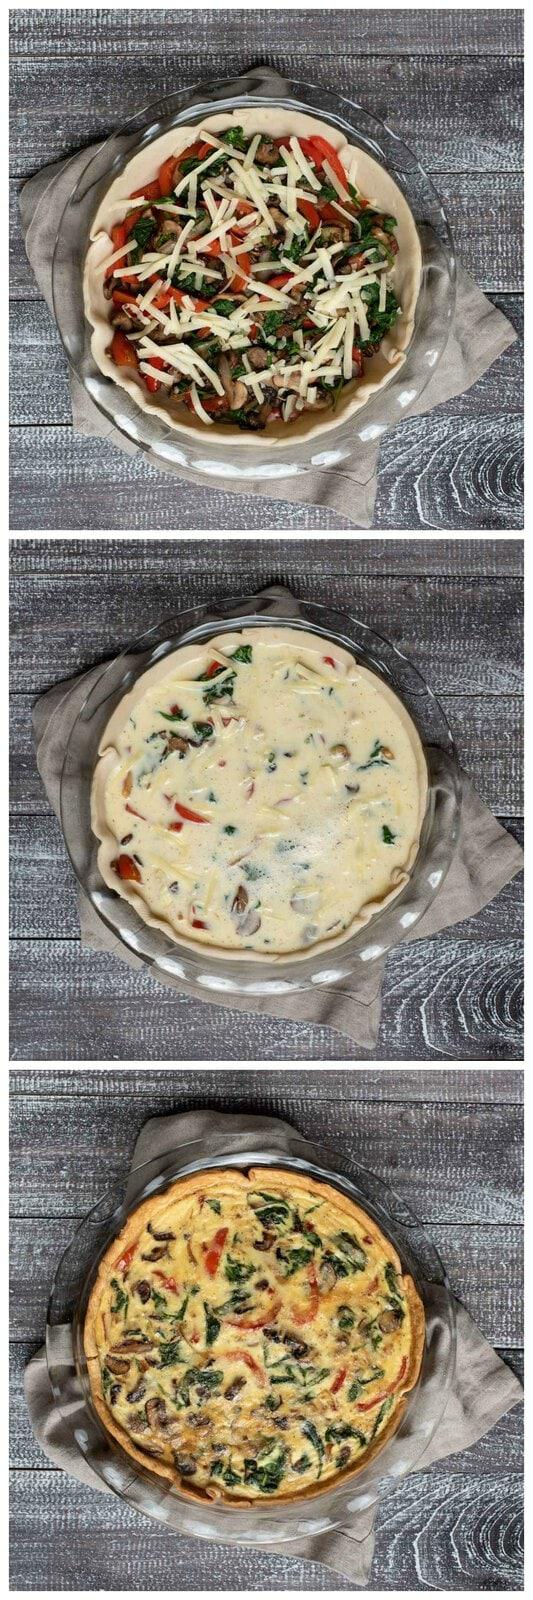 Series of three process pictures of easy veggie quiche recipe